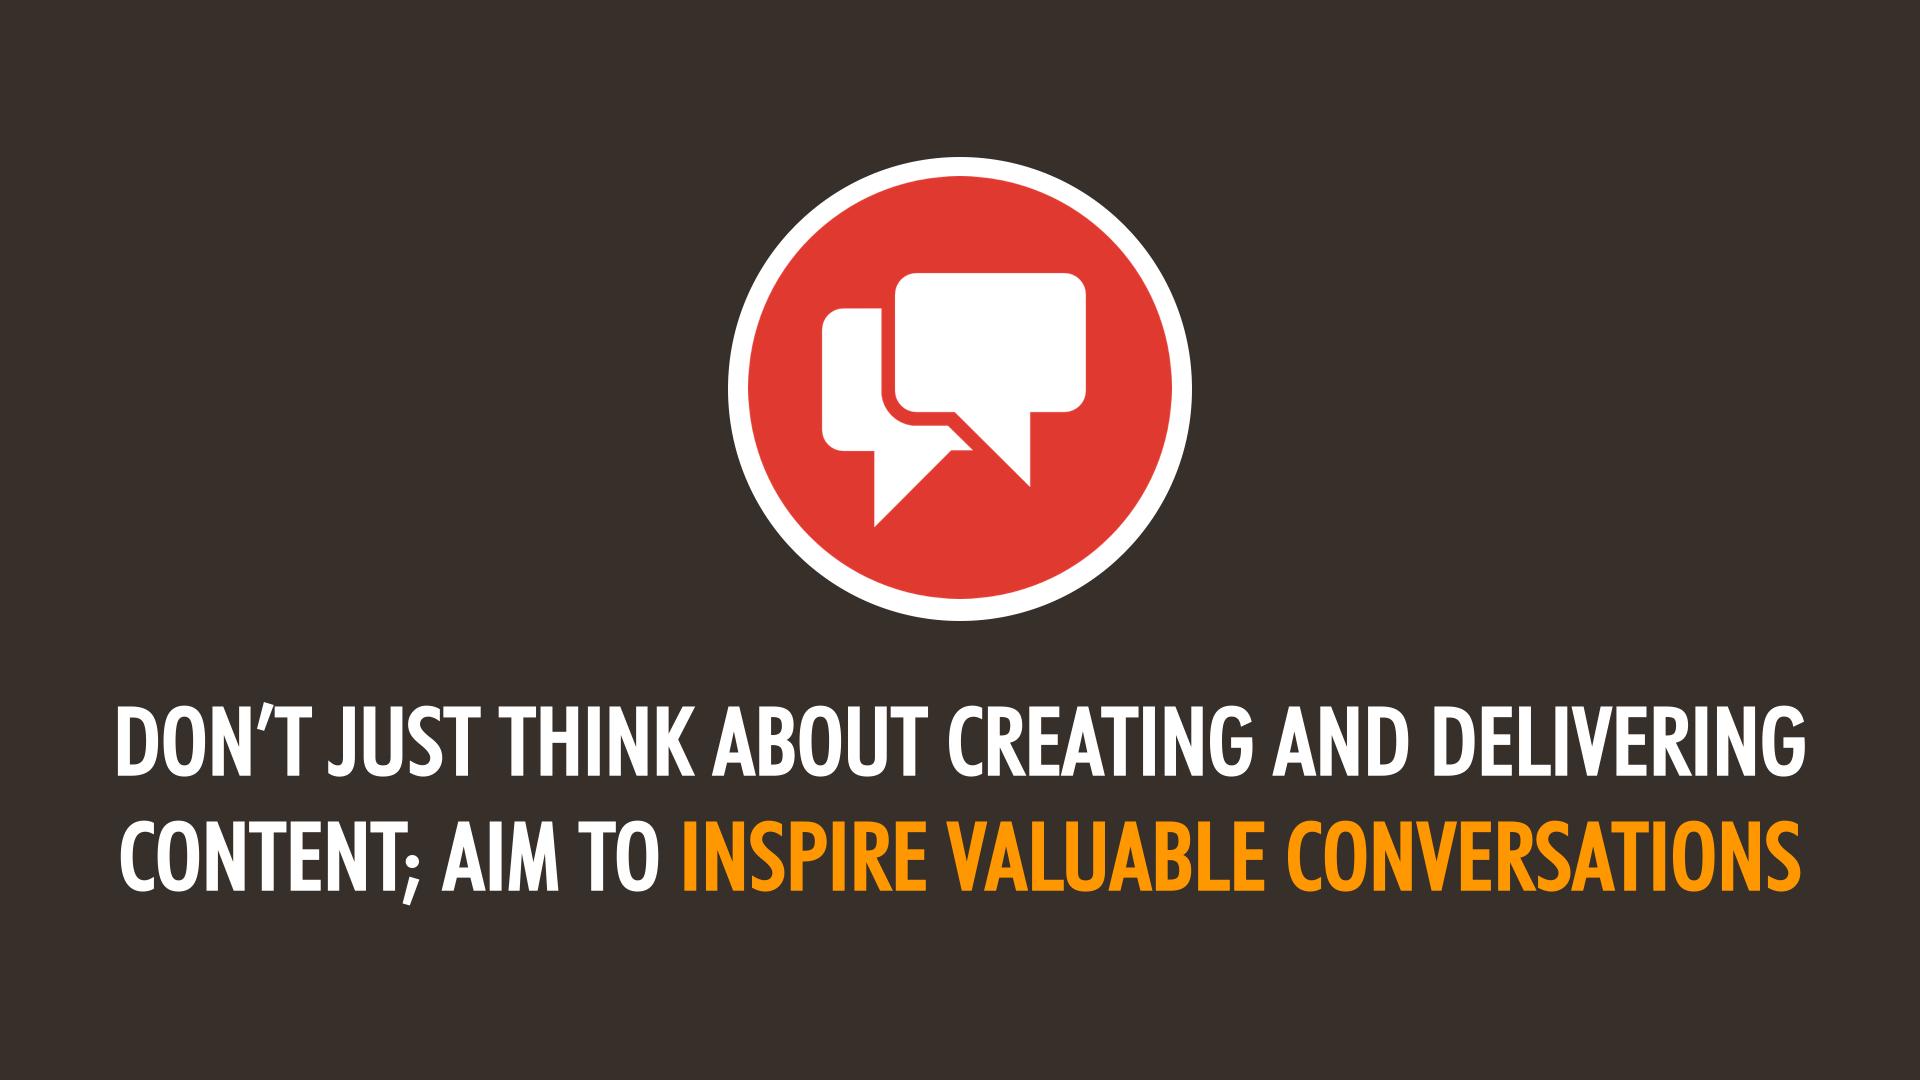 Social Media Success: Inspiring Meaningful Conversations